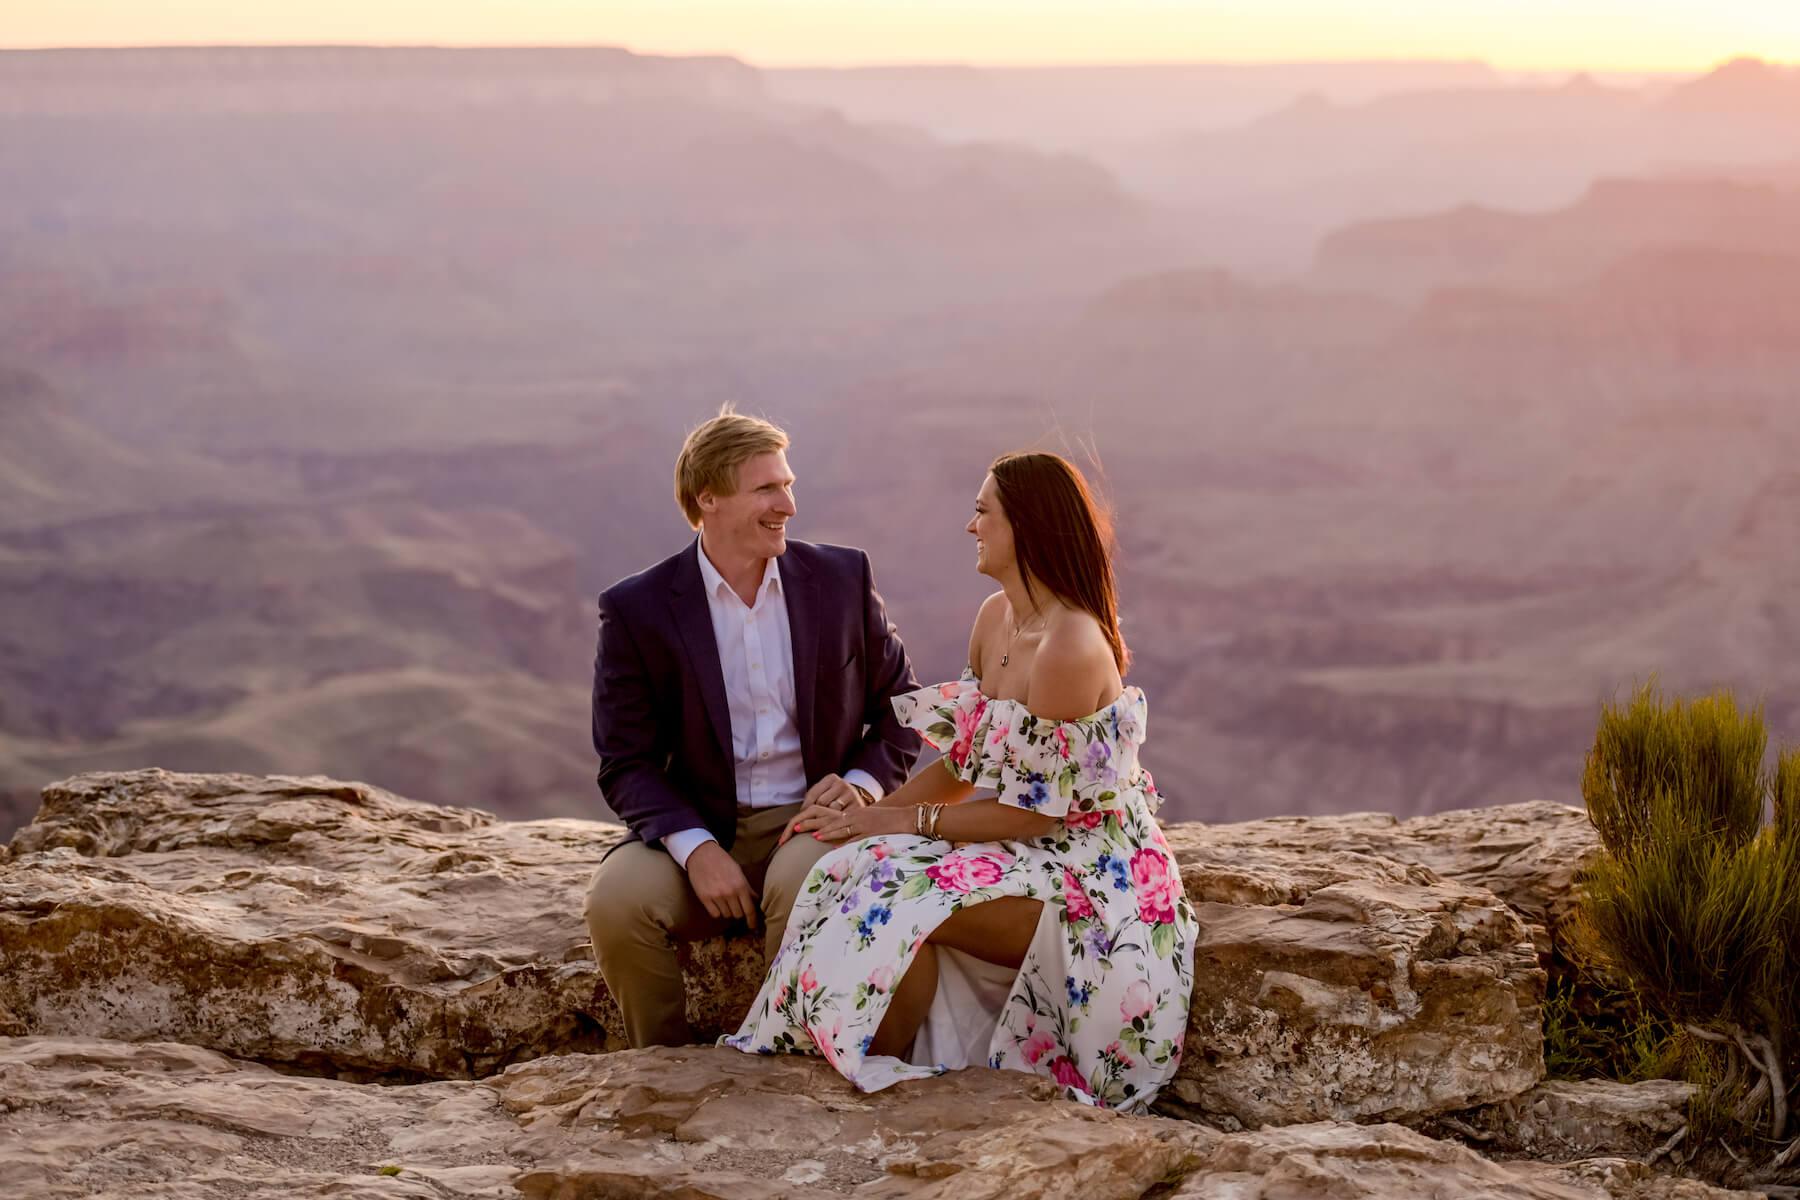 grand-canyon-06-14-2020-birthday-41_original